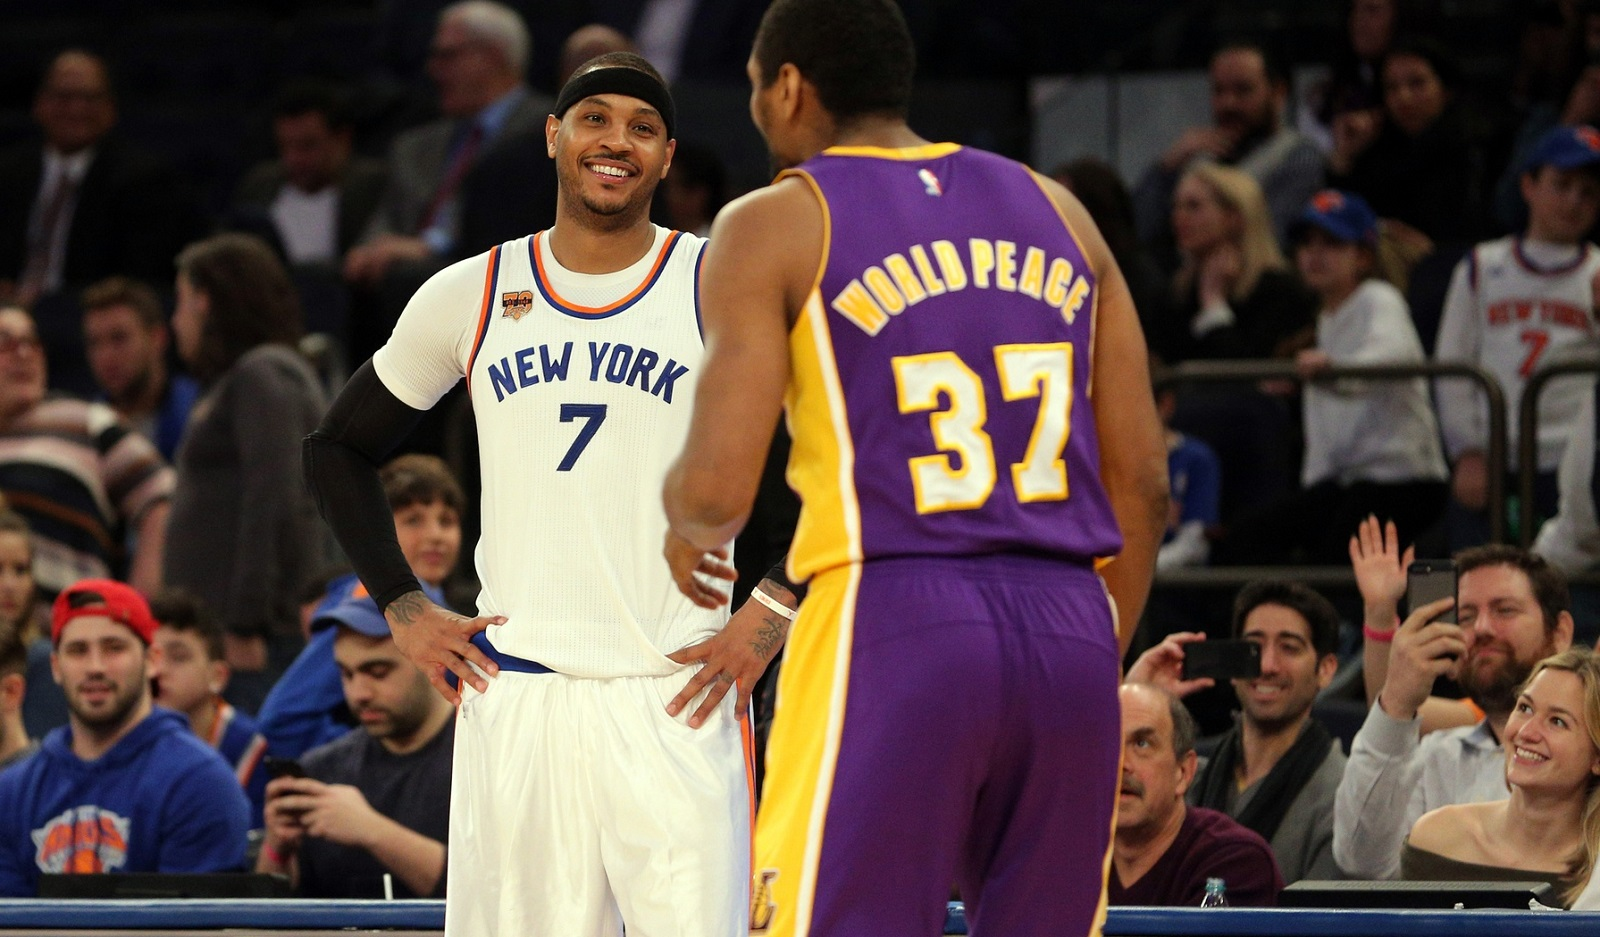 021517-NBA-New-York-Knicks-Los-Angeles-Lakers